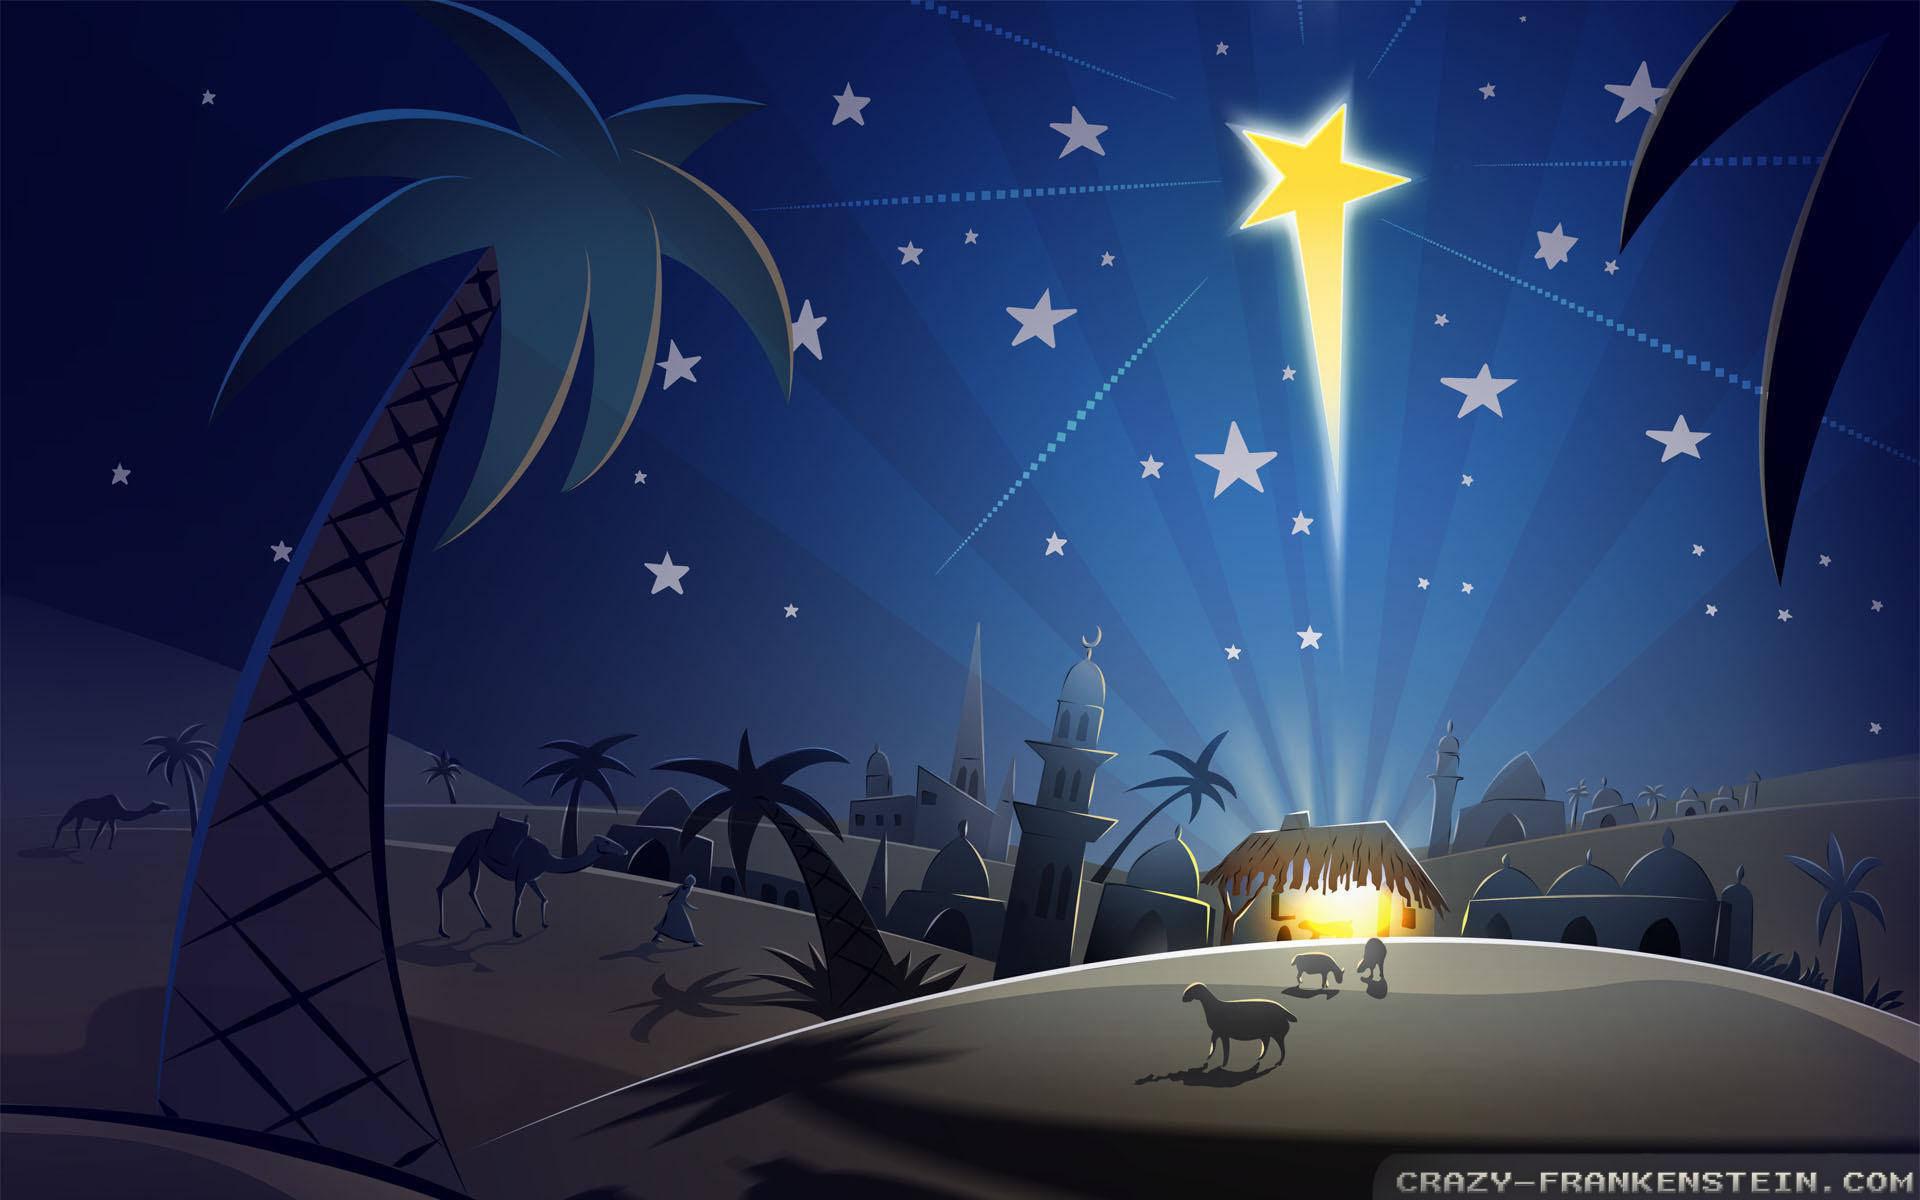 Wallpaper: Nativity Christmas star wallpapers. Resolution: 1024×768 |  1280×1024 | 1600×1200. Widescreen Res: 1440×900 | 1680×1050 | 1920×1200